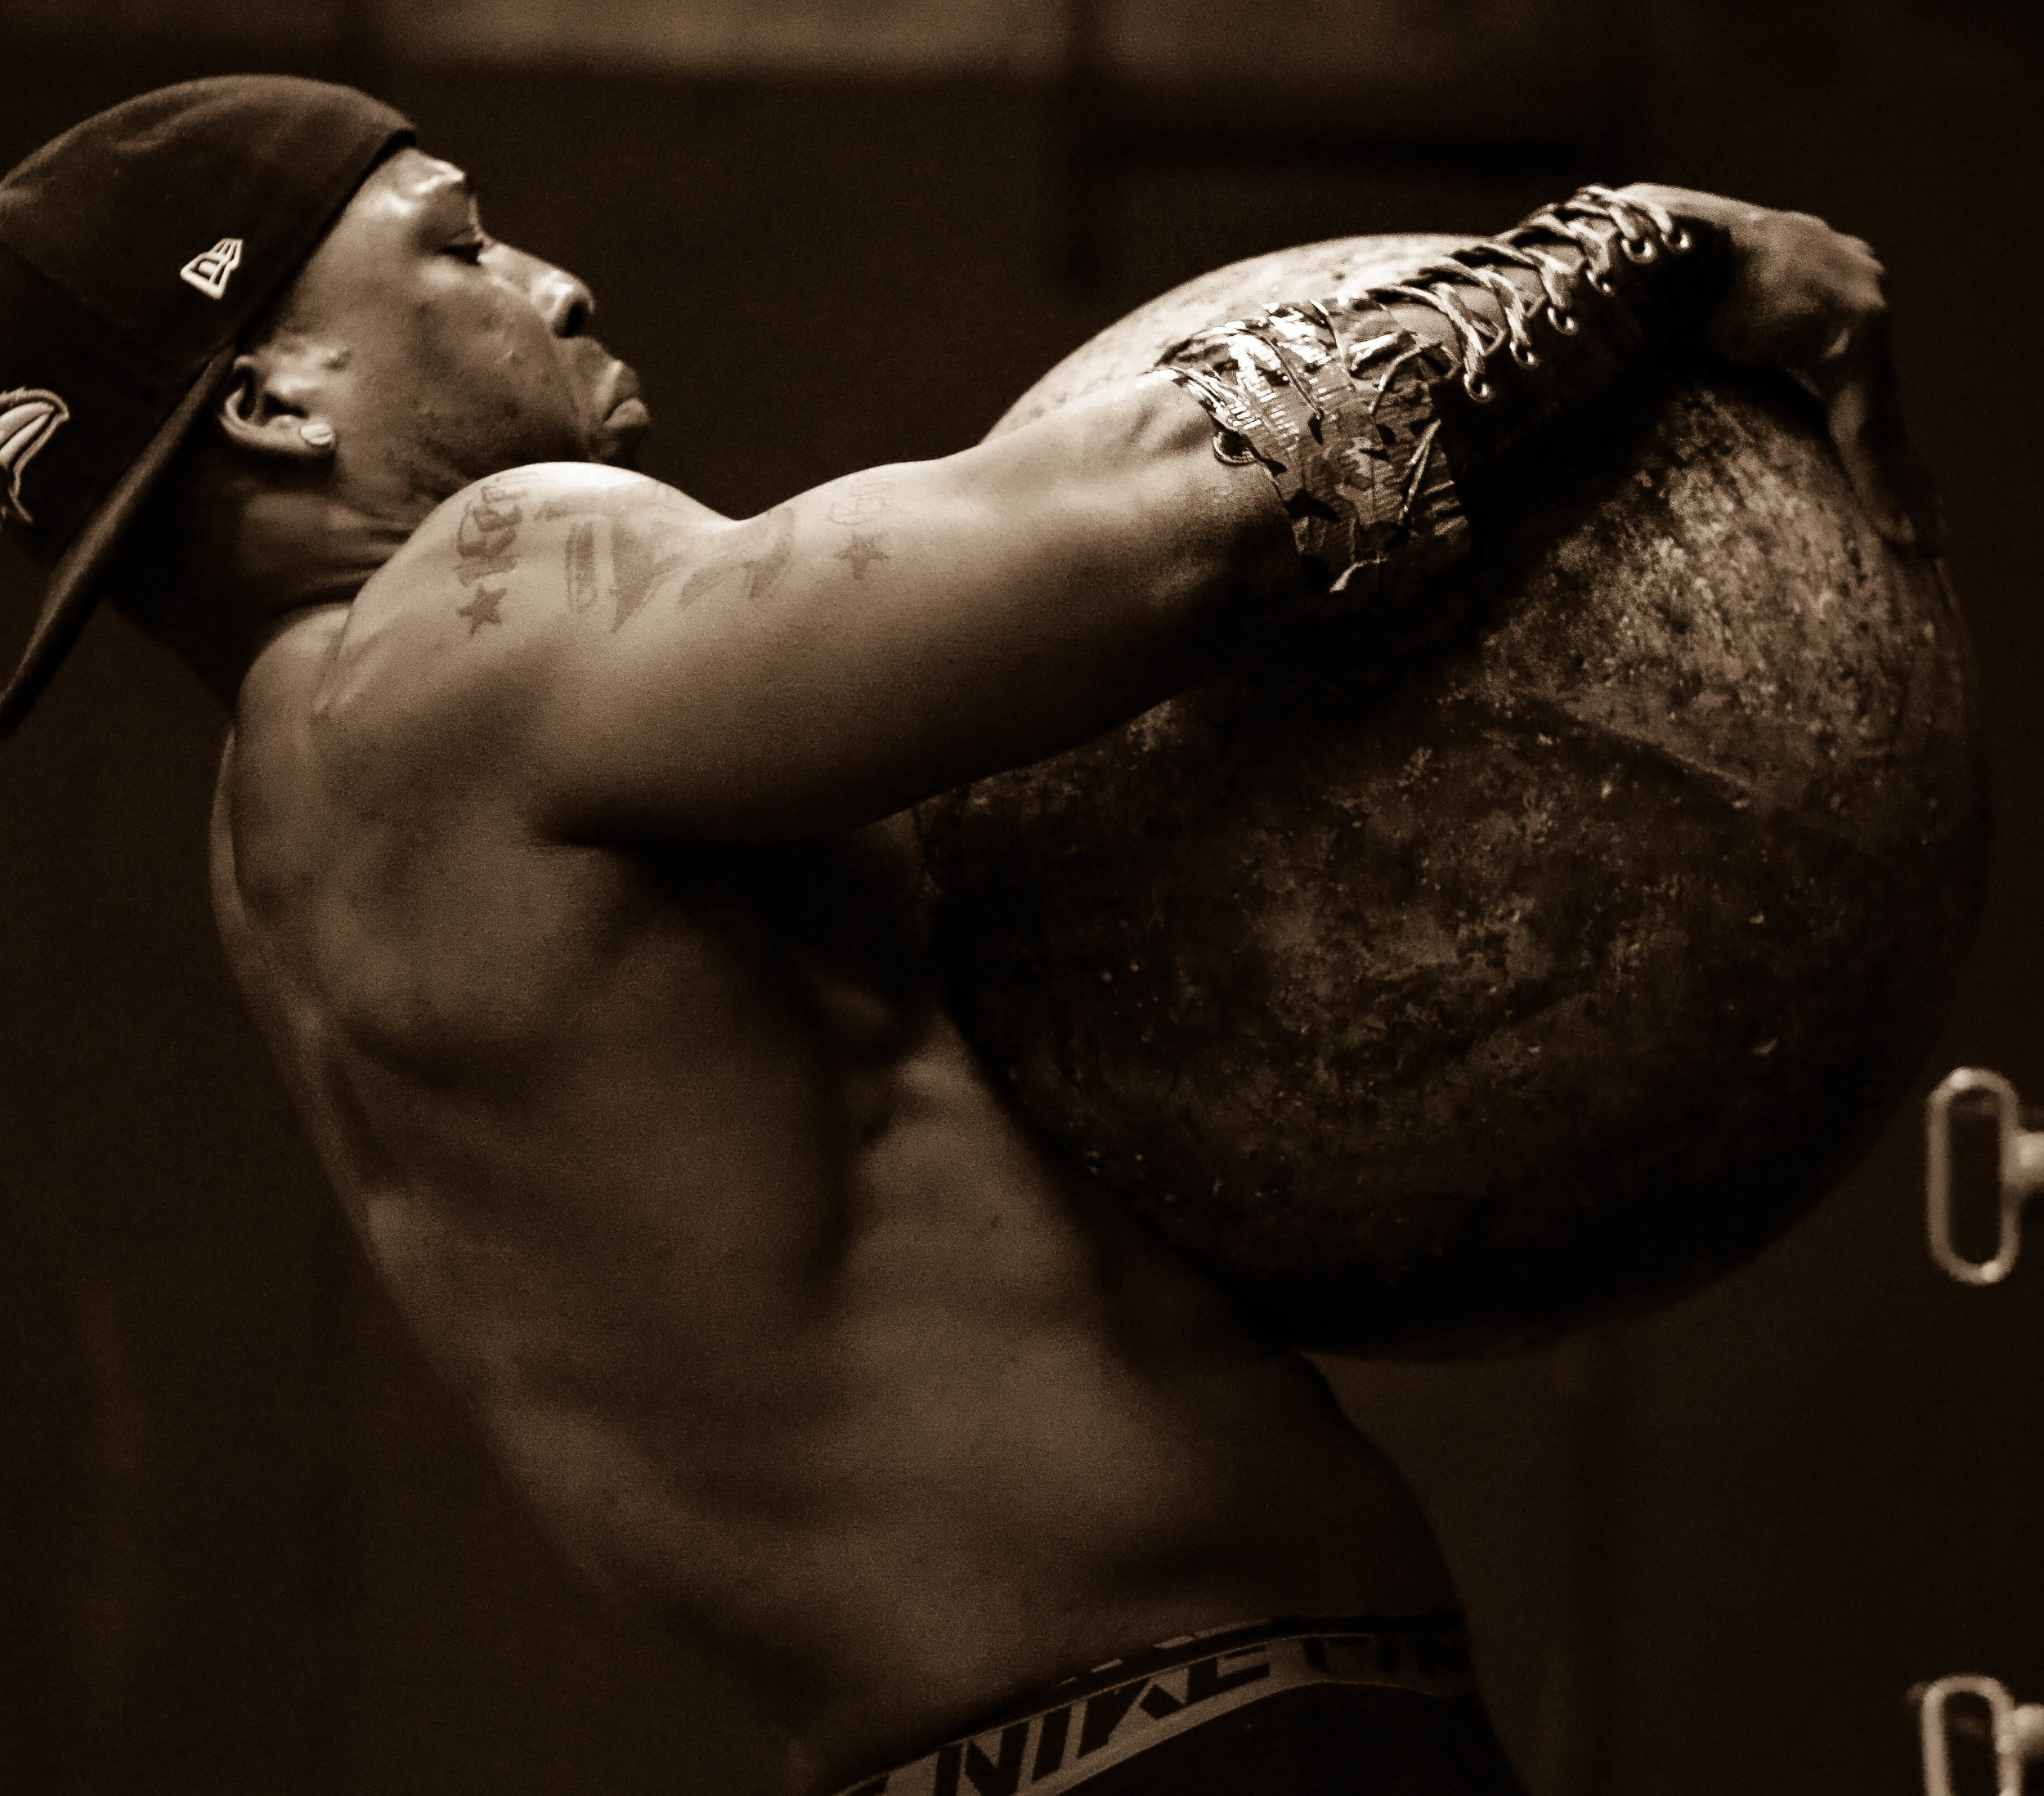 harrison strength_strong man_atlas stones-91.jpg